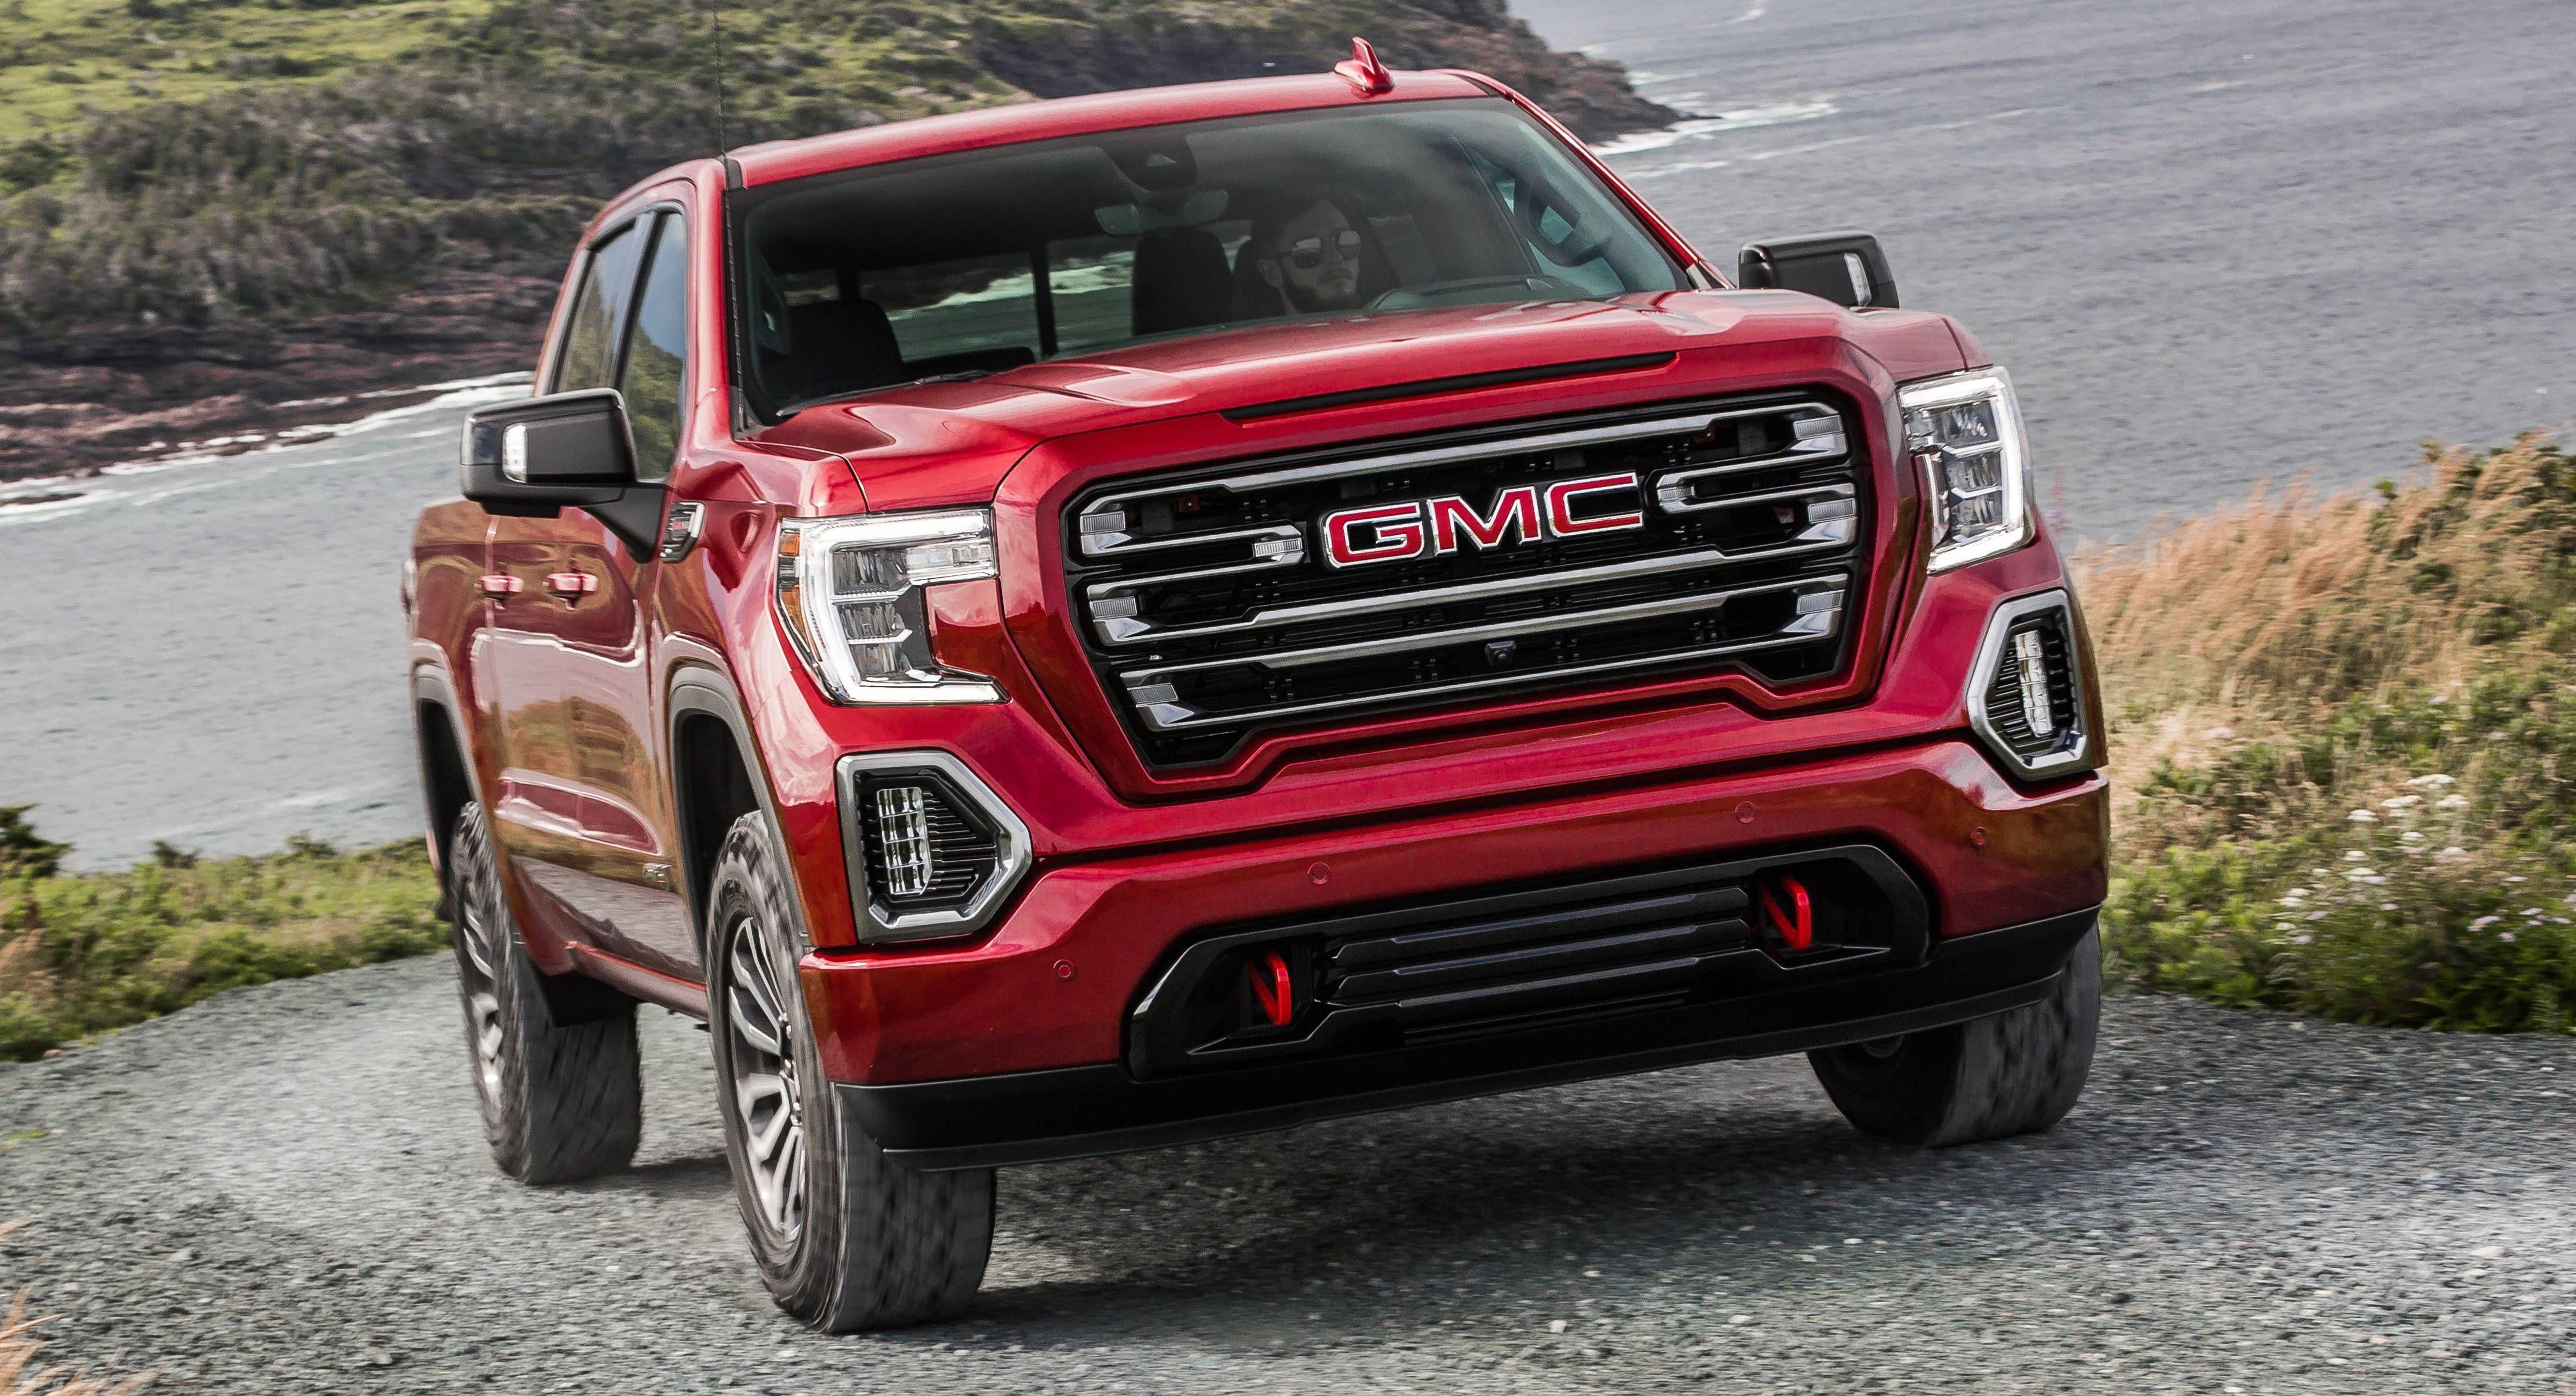 2019 Gmc Sierra At4 Off Road Performance Package Gains 435hp 6 2l V8 Gmc Sierra Gmc Pickup Trucks Gmc